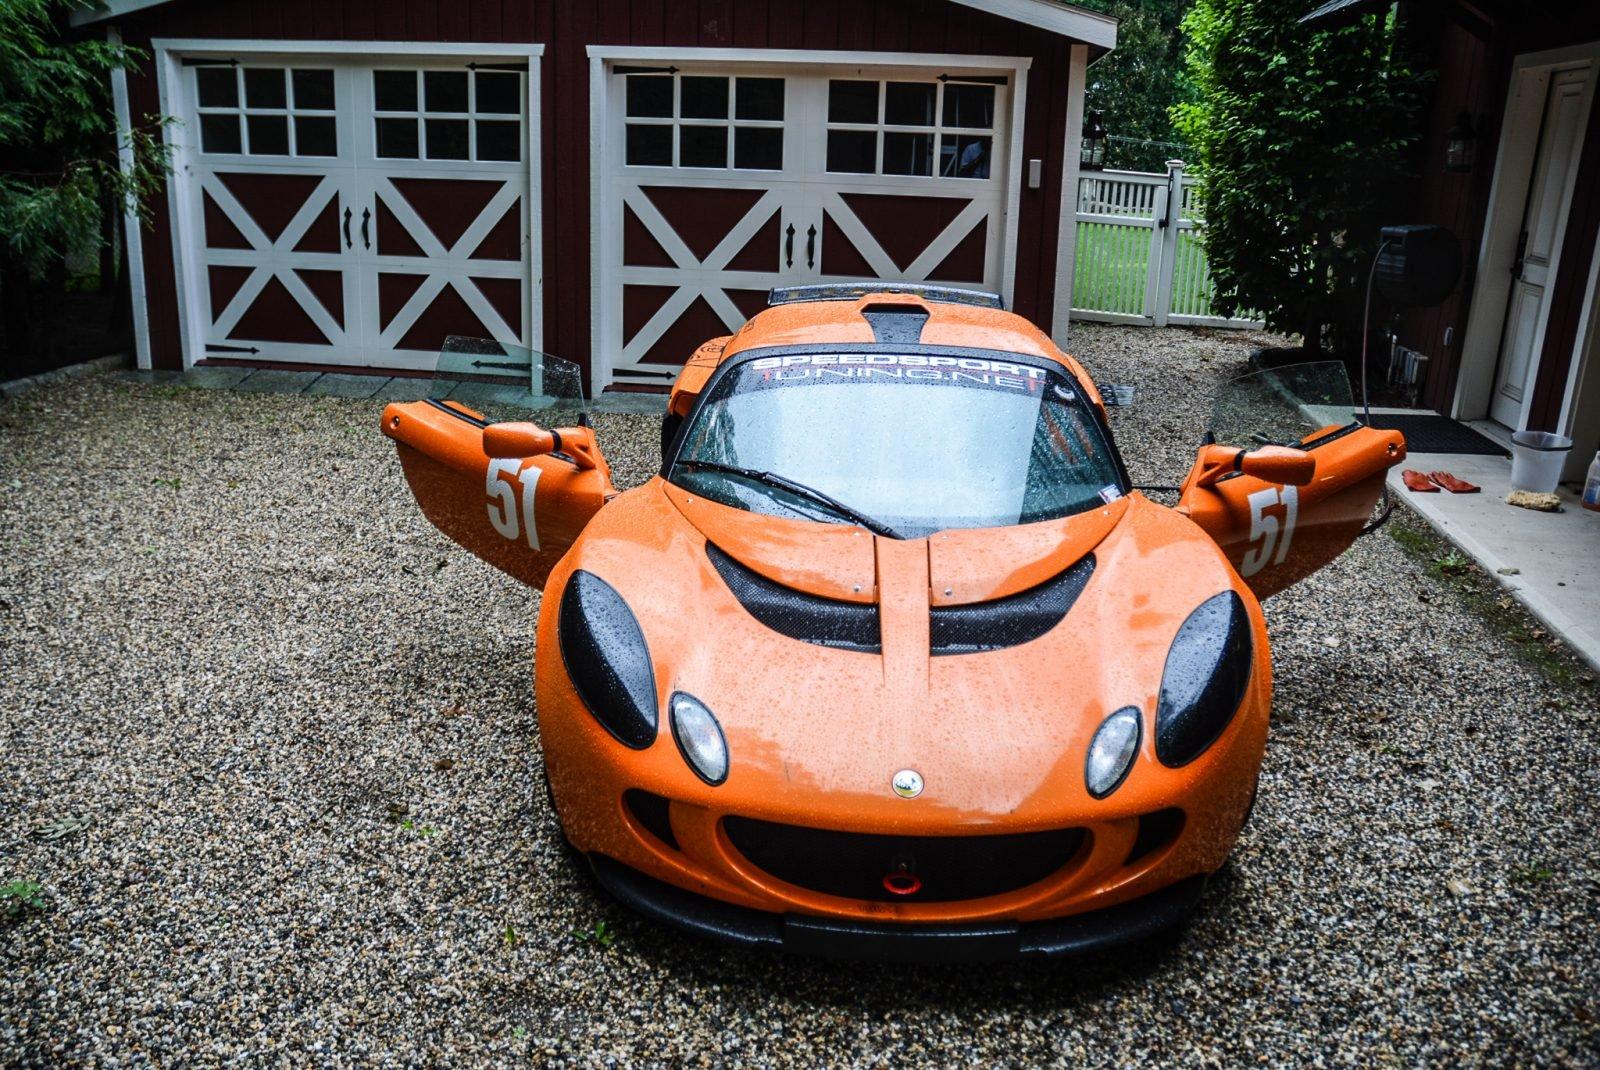 2006 Lotus Exige Cup 240 Factory Built Race Car FIA Rare $ob For Sale (picture 2 of 6)